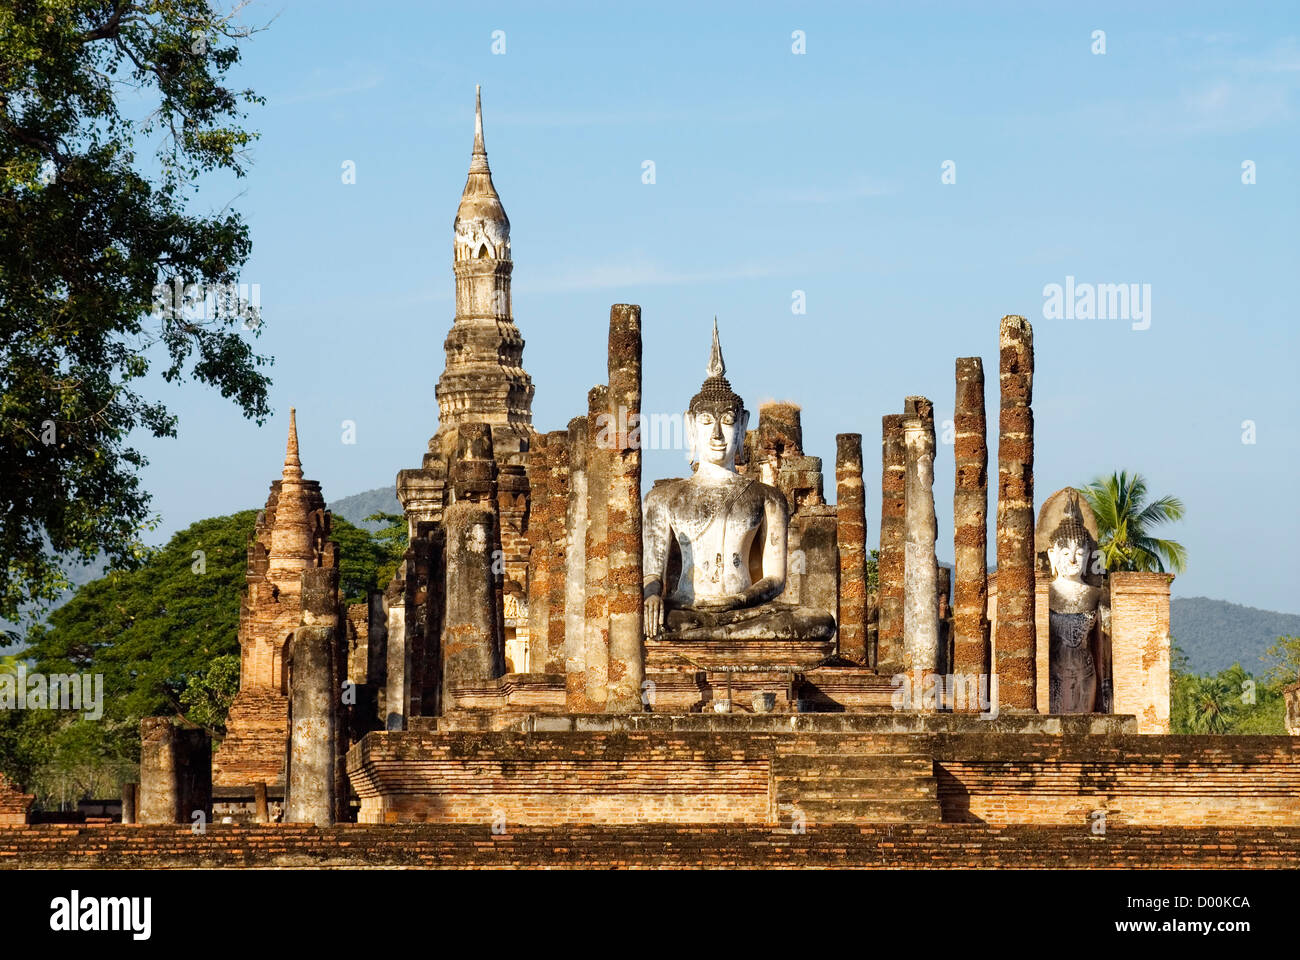 Wat Mahathat, Sukhothai Historical Park, Thailand   Wat Mahathat, Sukhothai Geschichtsparks Sukhothai, Thailand Stock Photo